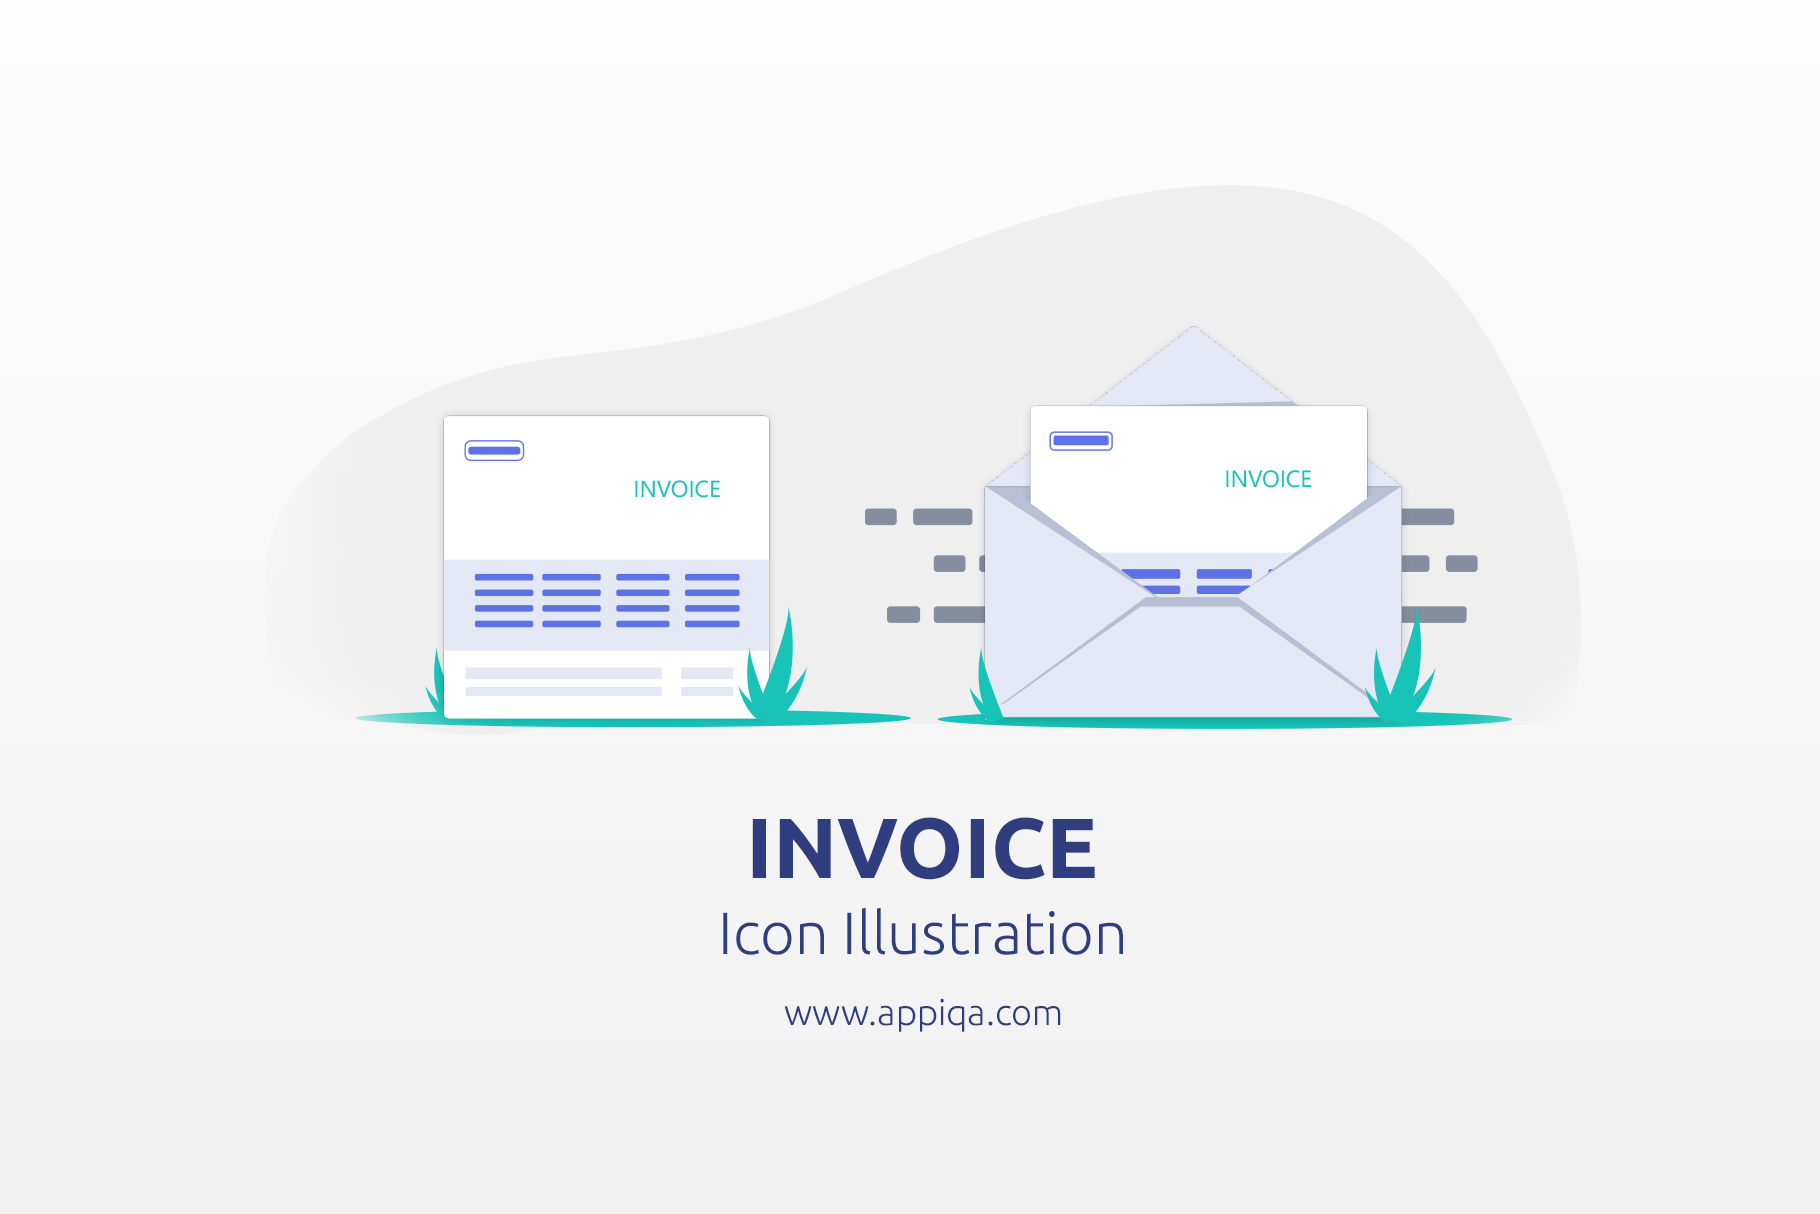 Free Invoice Icon Illustration Editable SVG